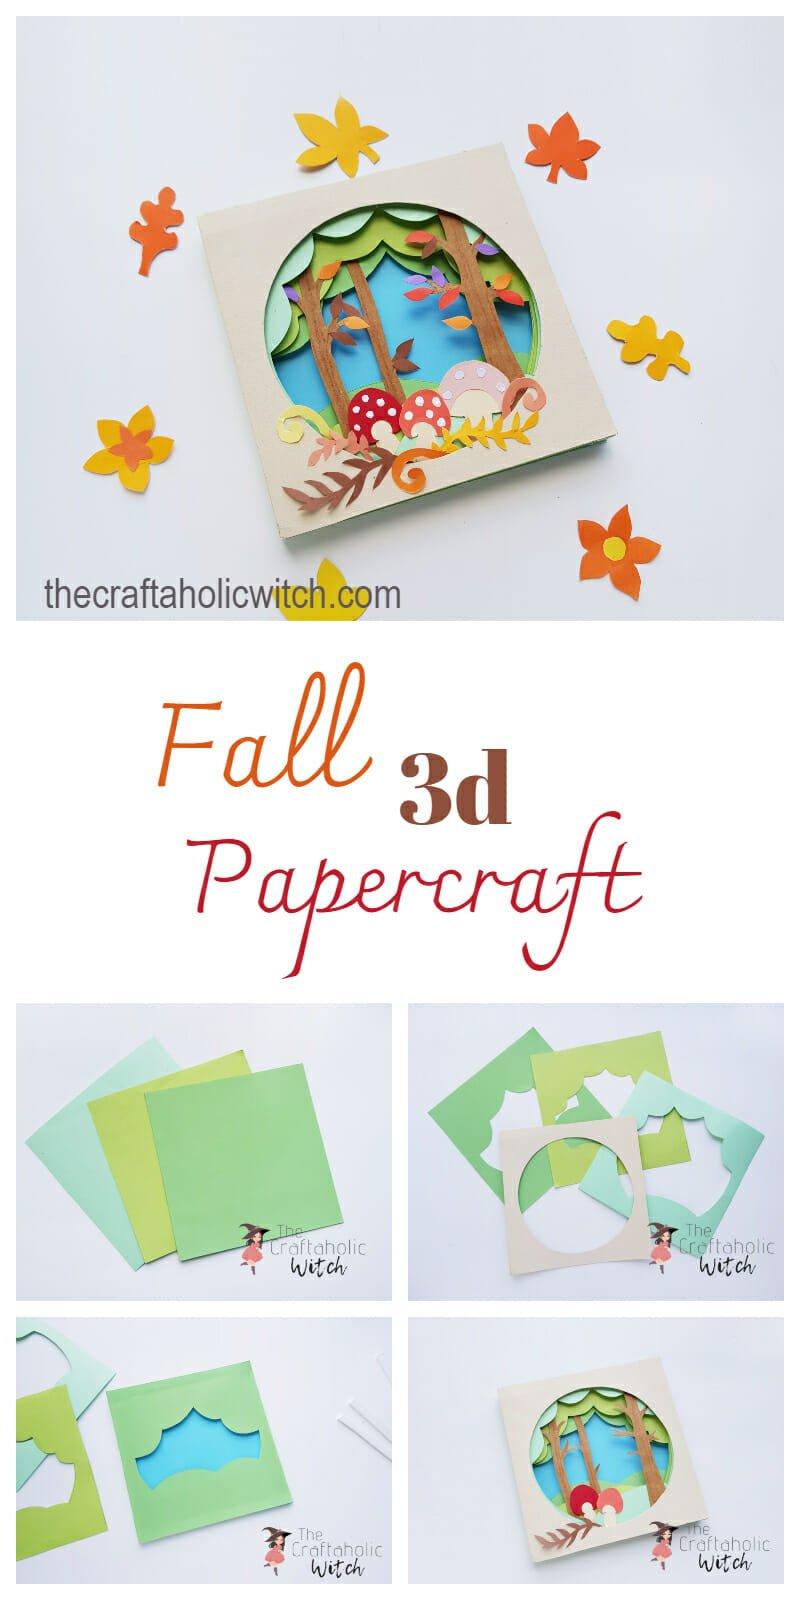 3d papercraft scene